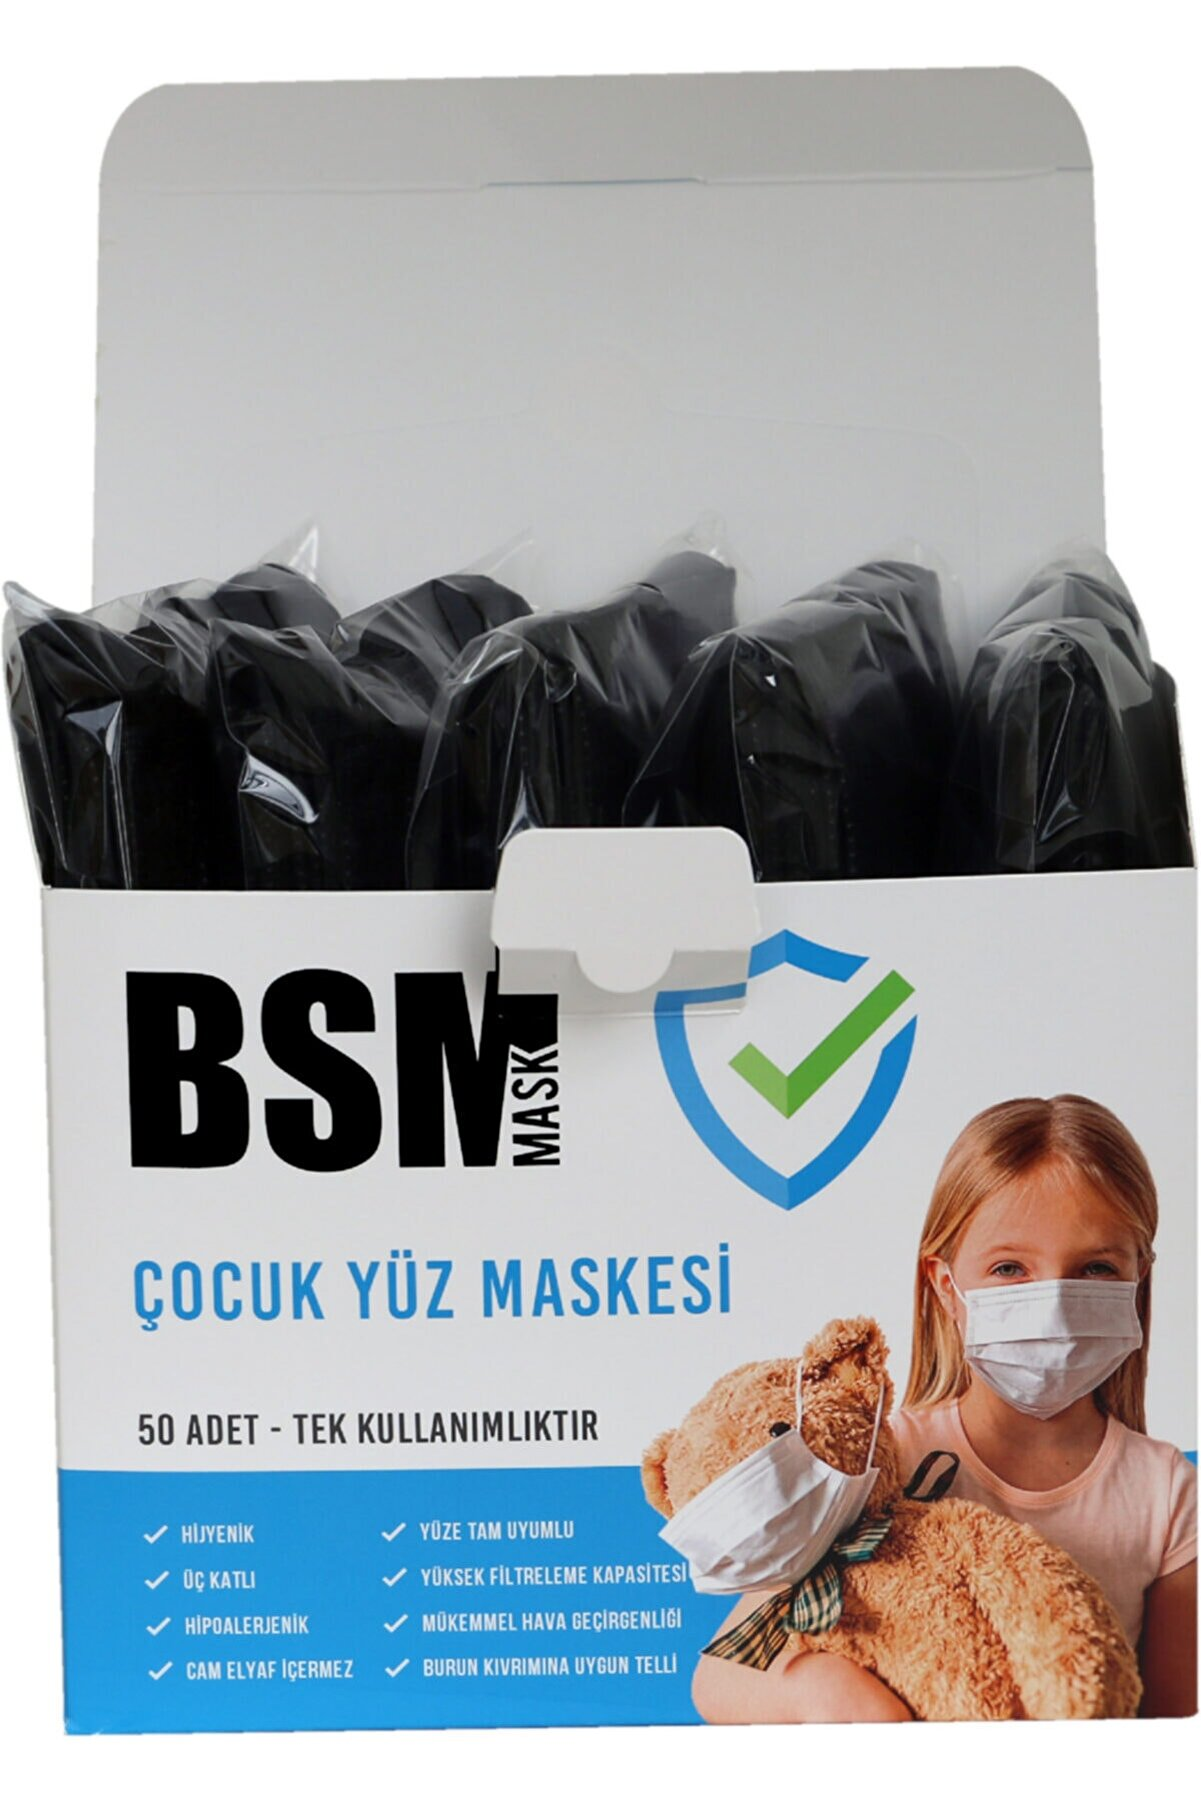 BSM Extra Hijyenik 10'lu Paket Siyah Medikal Çocuk Maskesi 50 Adet